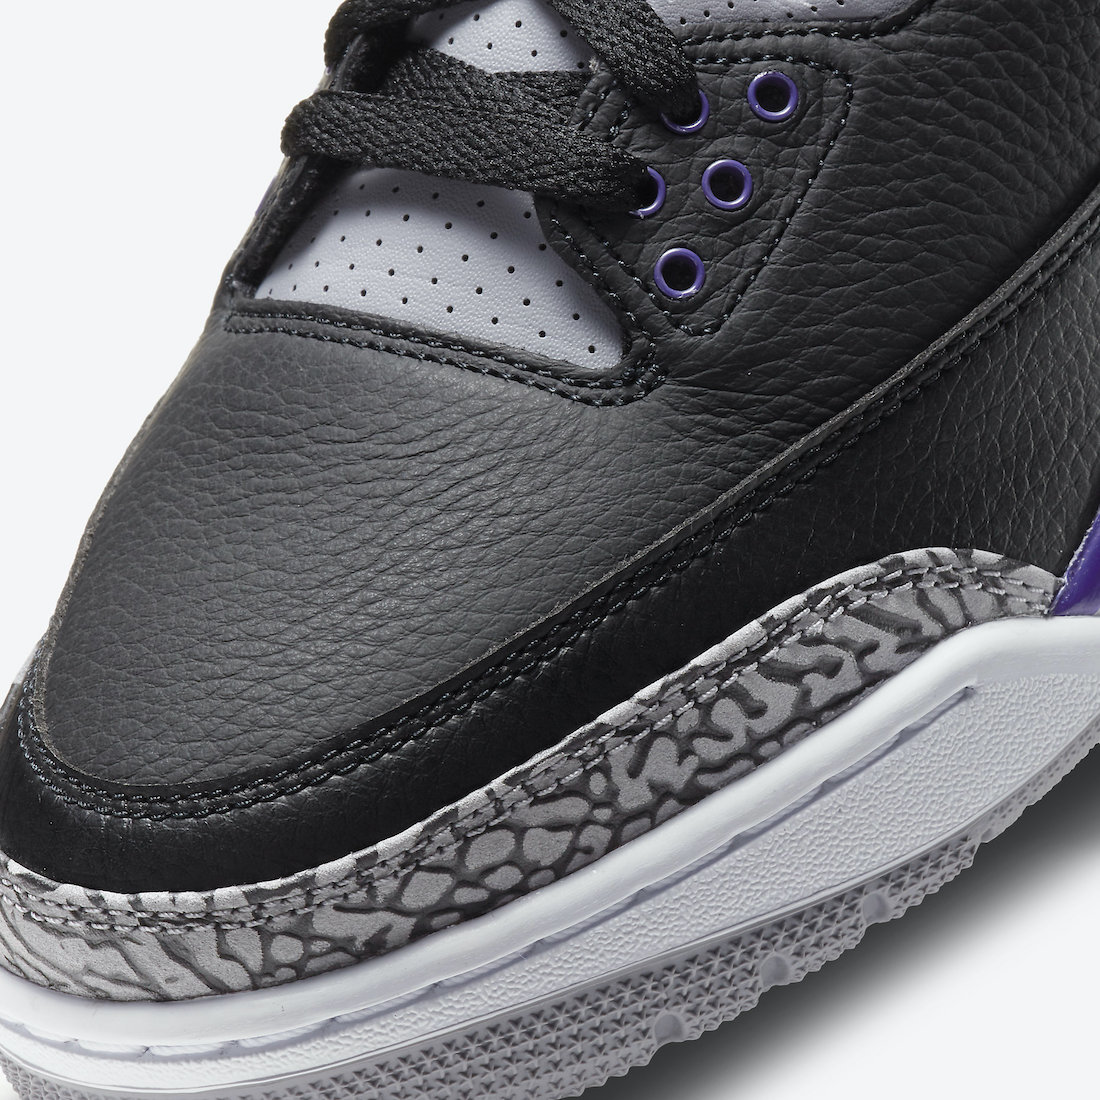 Air Jordan 3 'Black Court Purple' CT8532-050 5